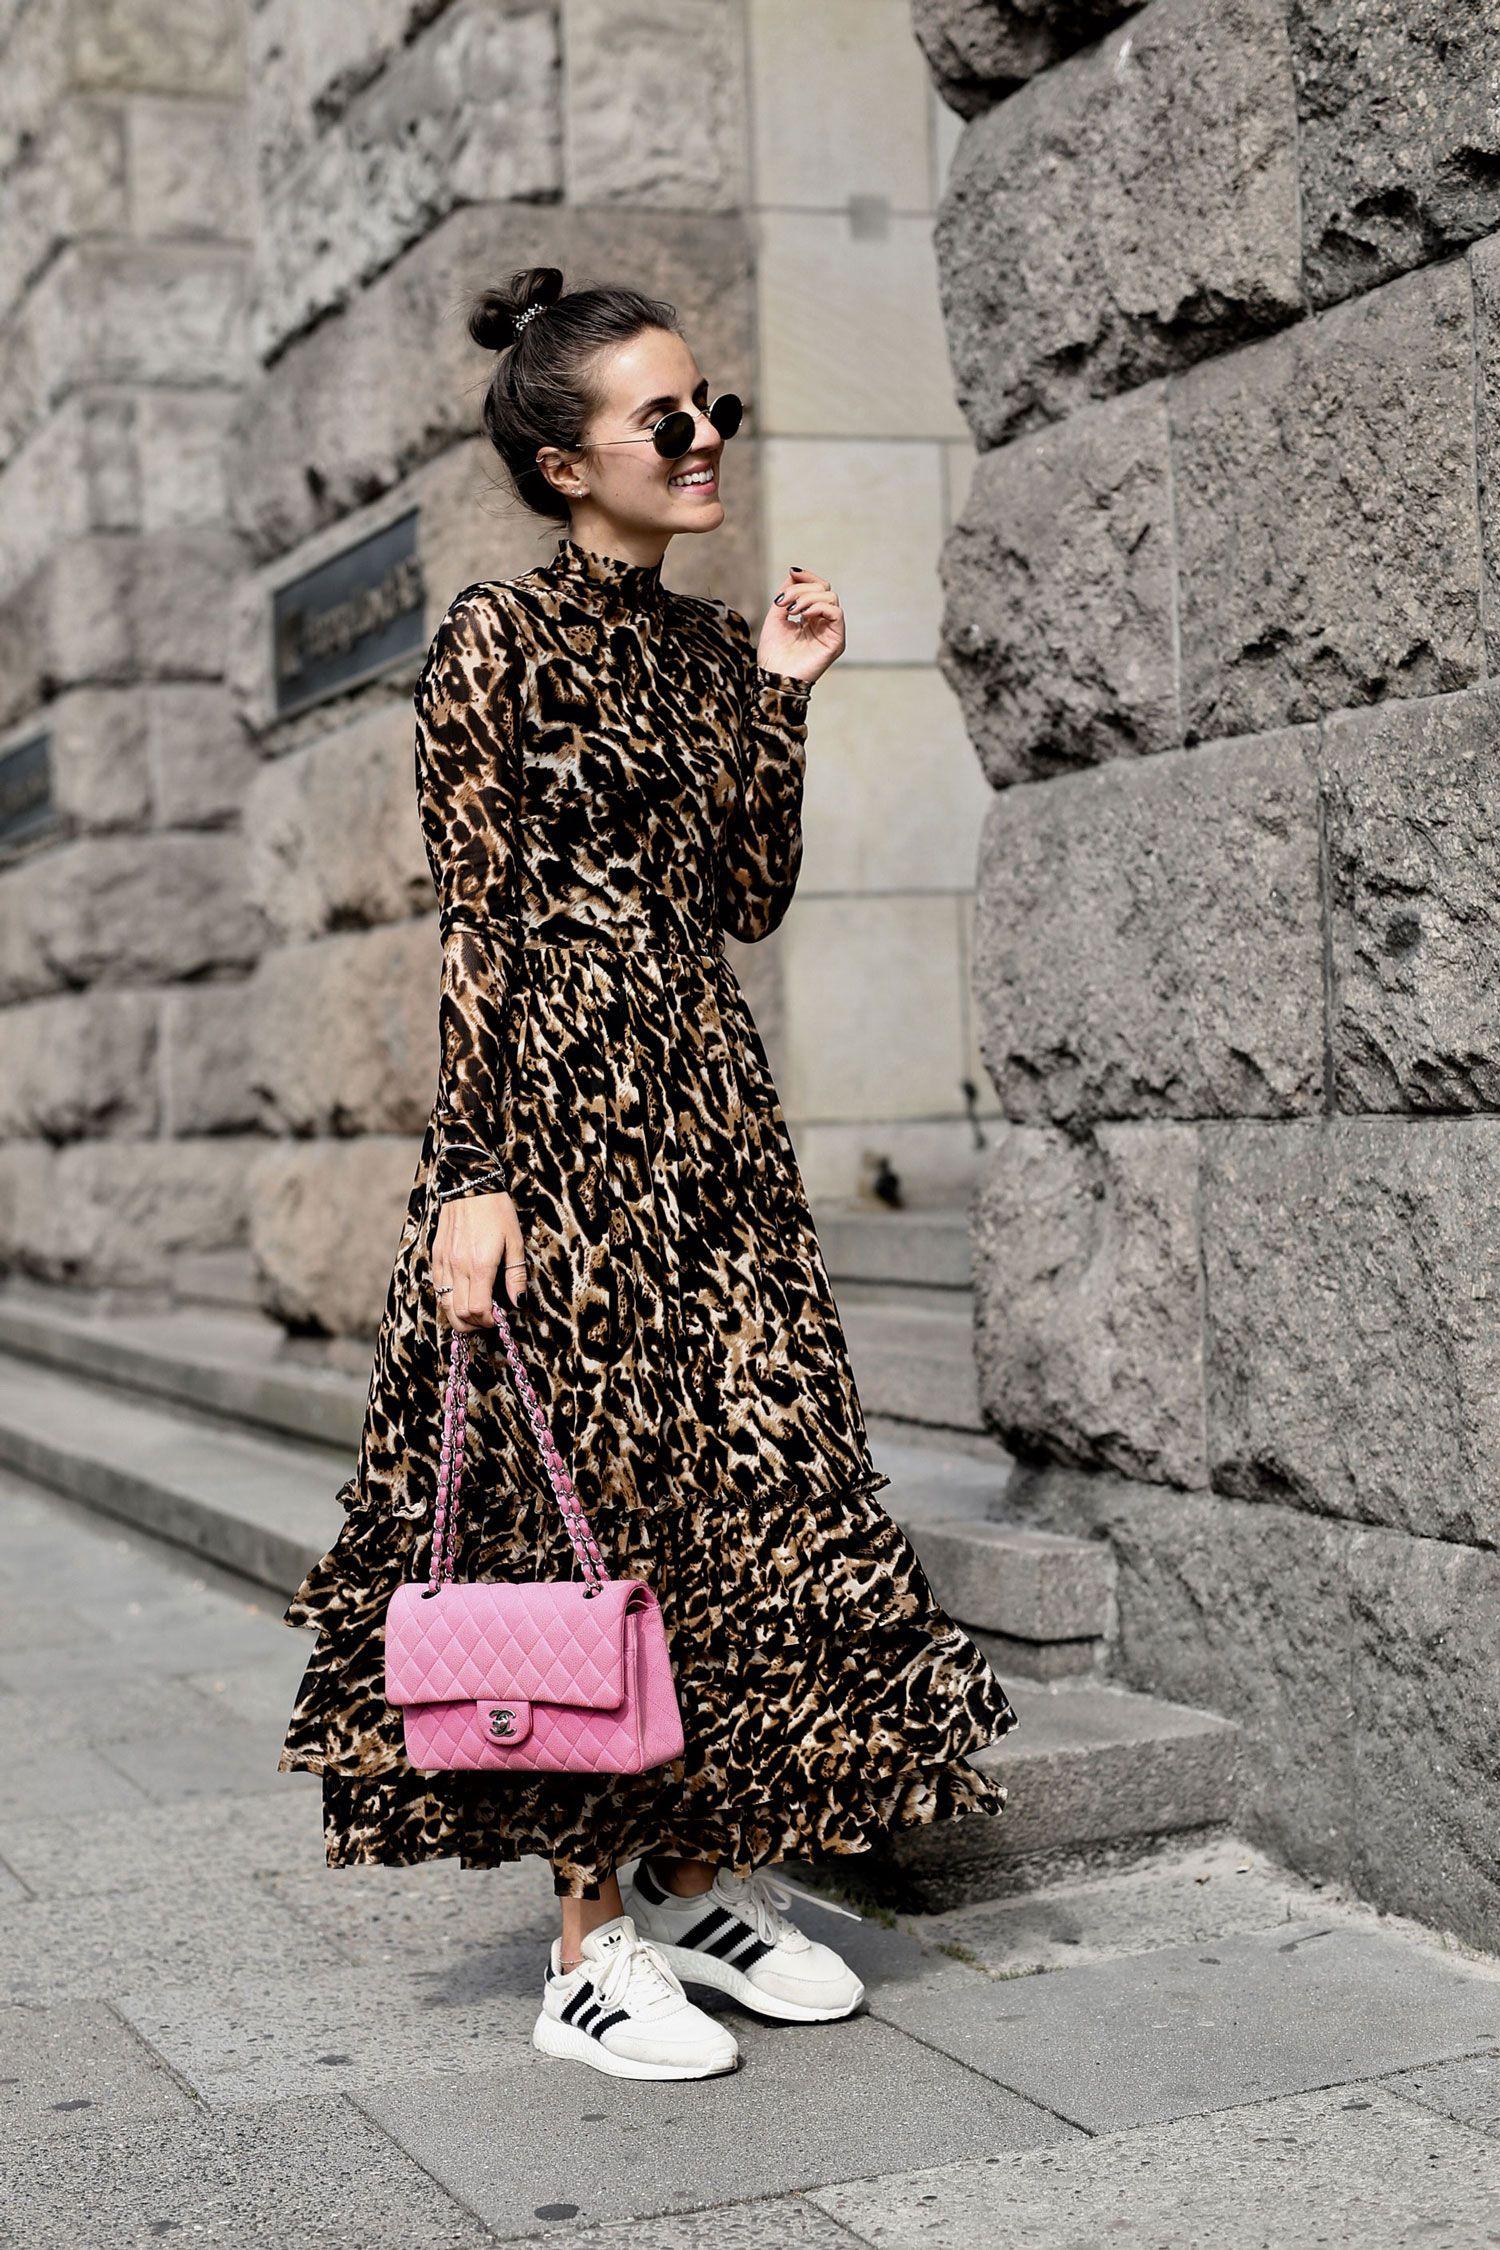 76fe30a5e83e Streetstyle - Leo Kleid Und Pinke Chanel - Shoppisticated | Animal ...